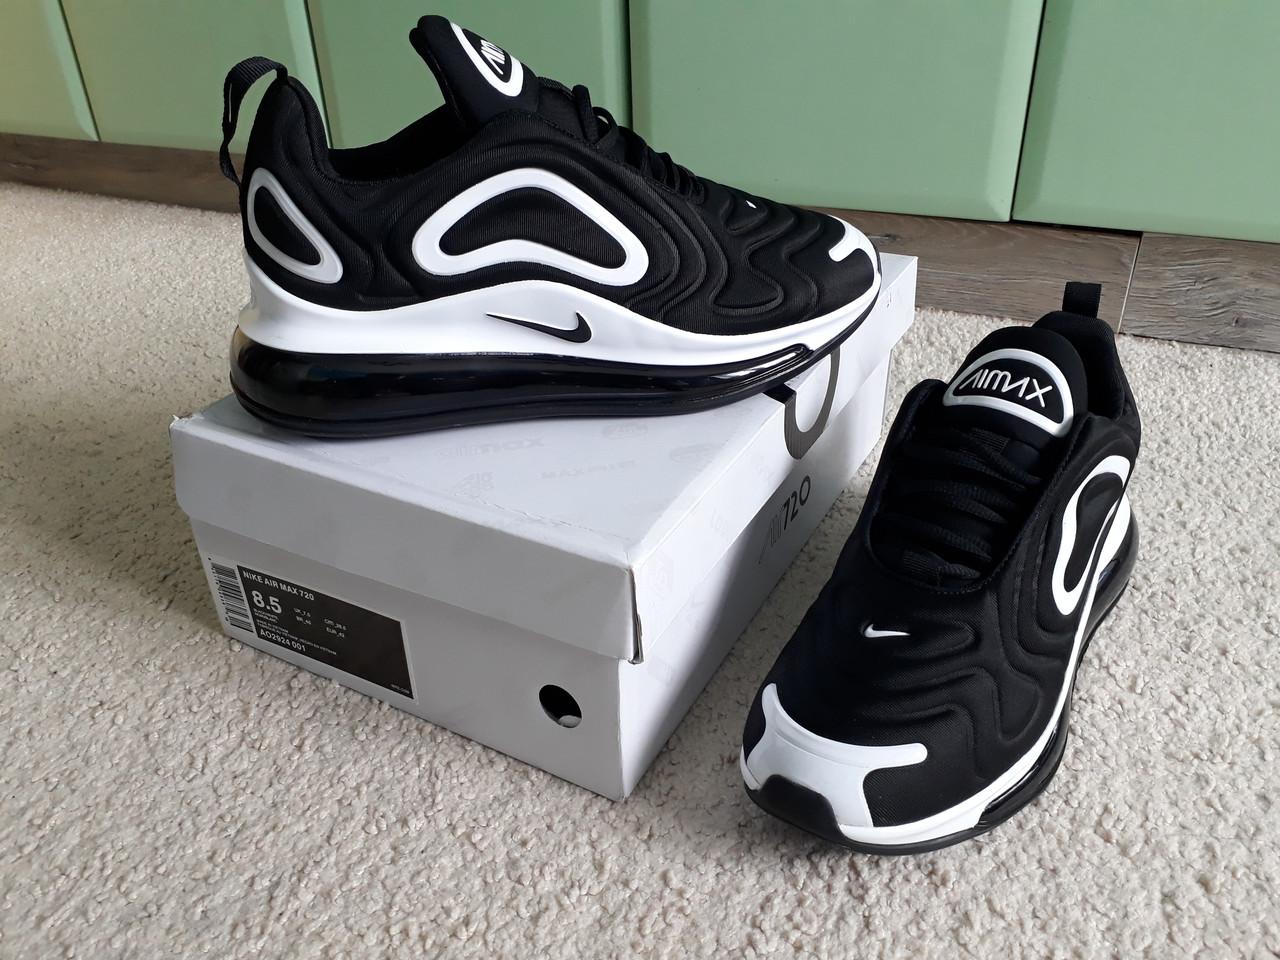 d4475a41a7e0f6 Мужские кроссовки Nike Air Max 720 Black/White черные белые - sinitsa_shop  - интернет-